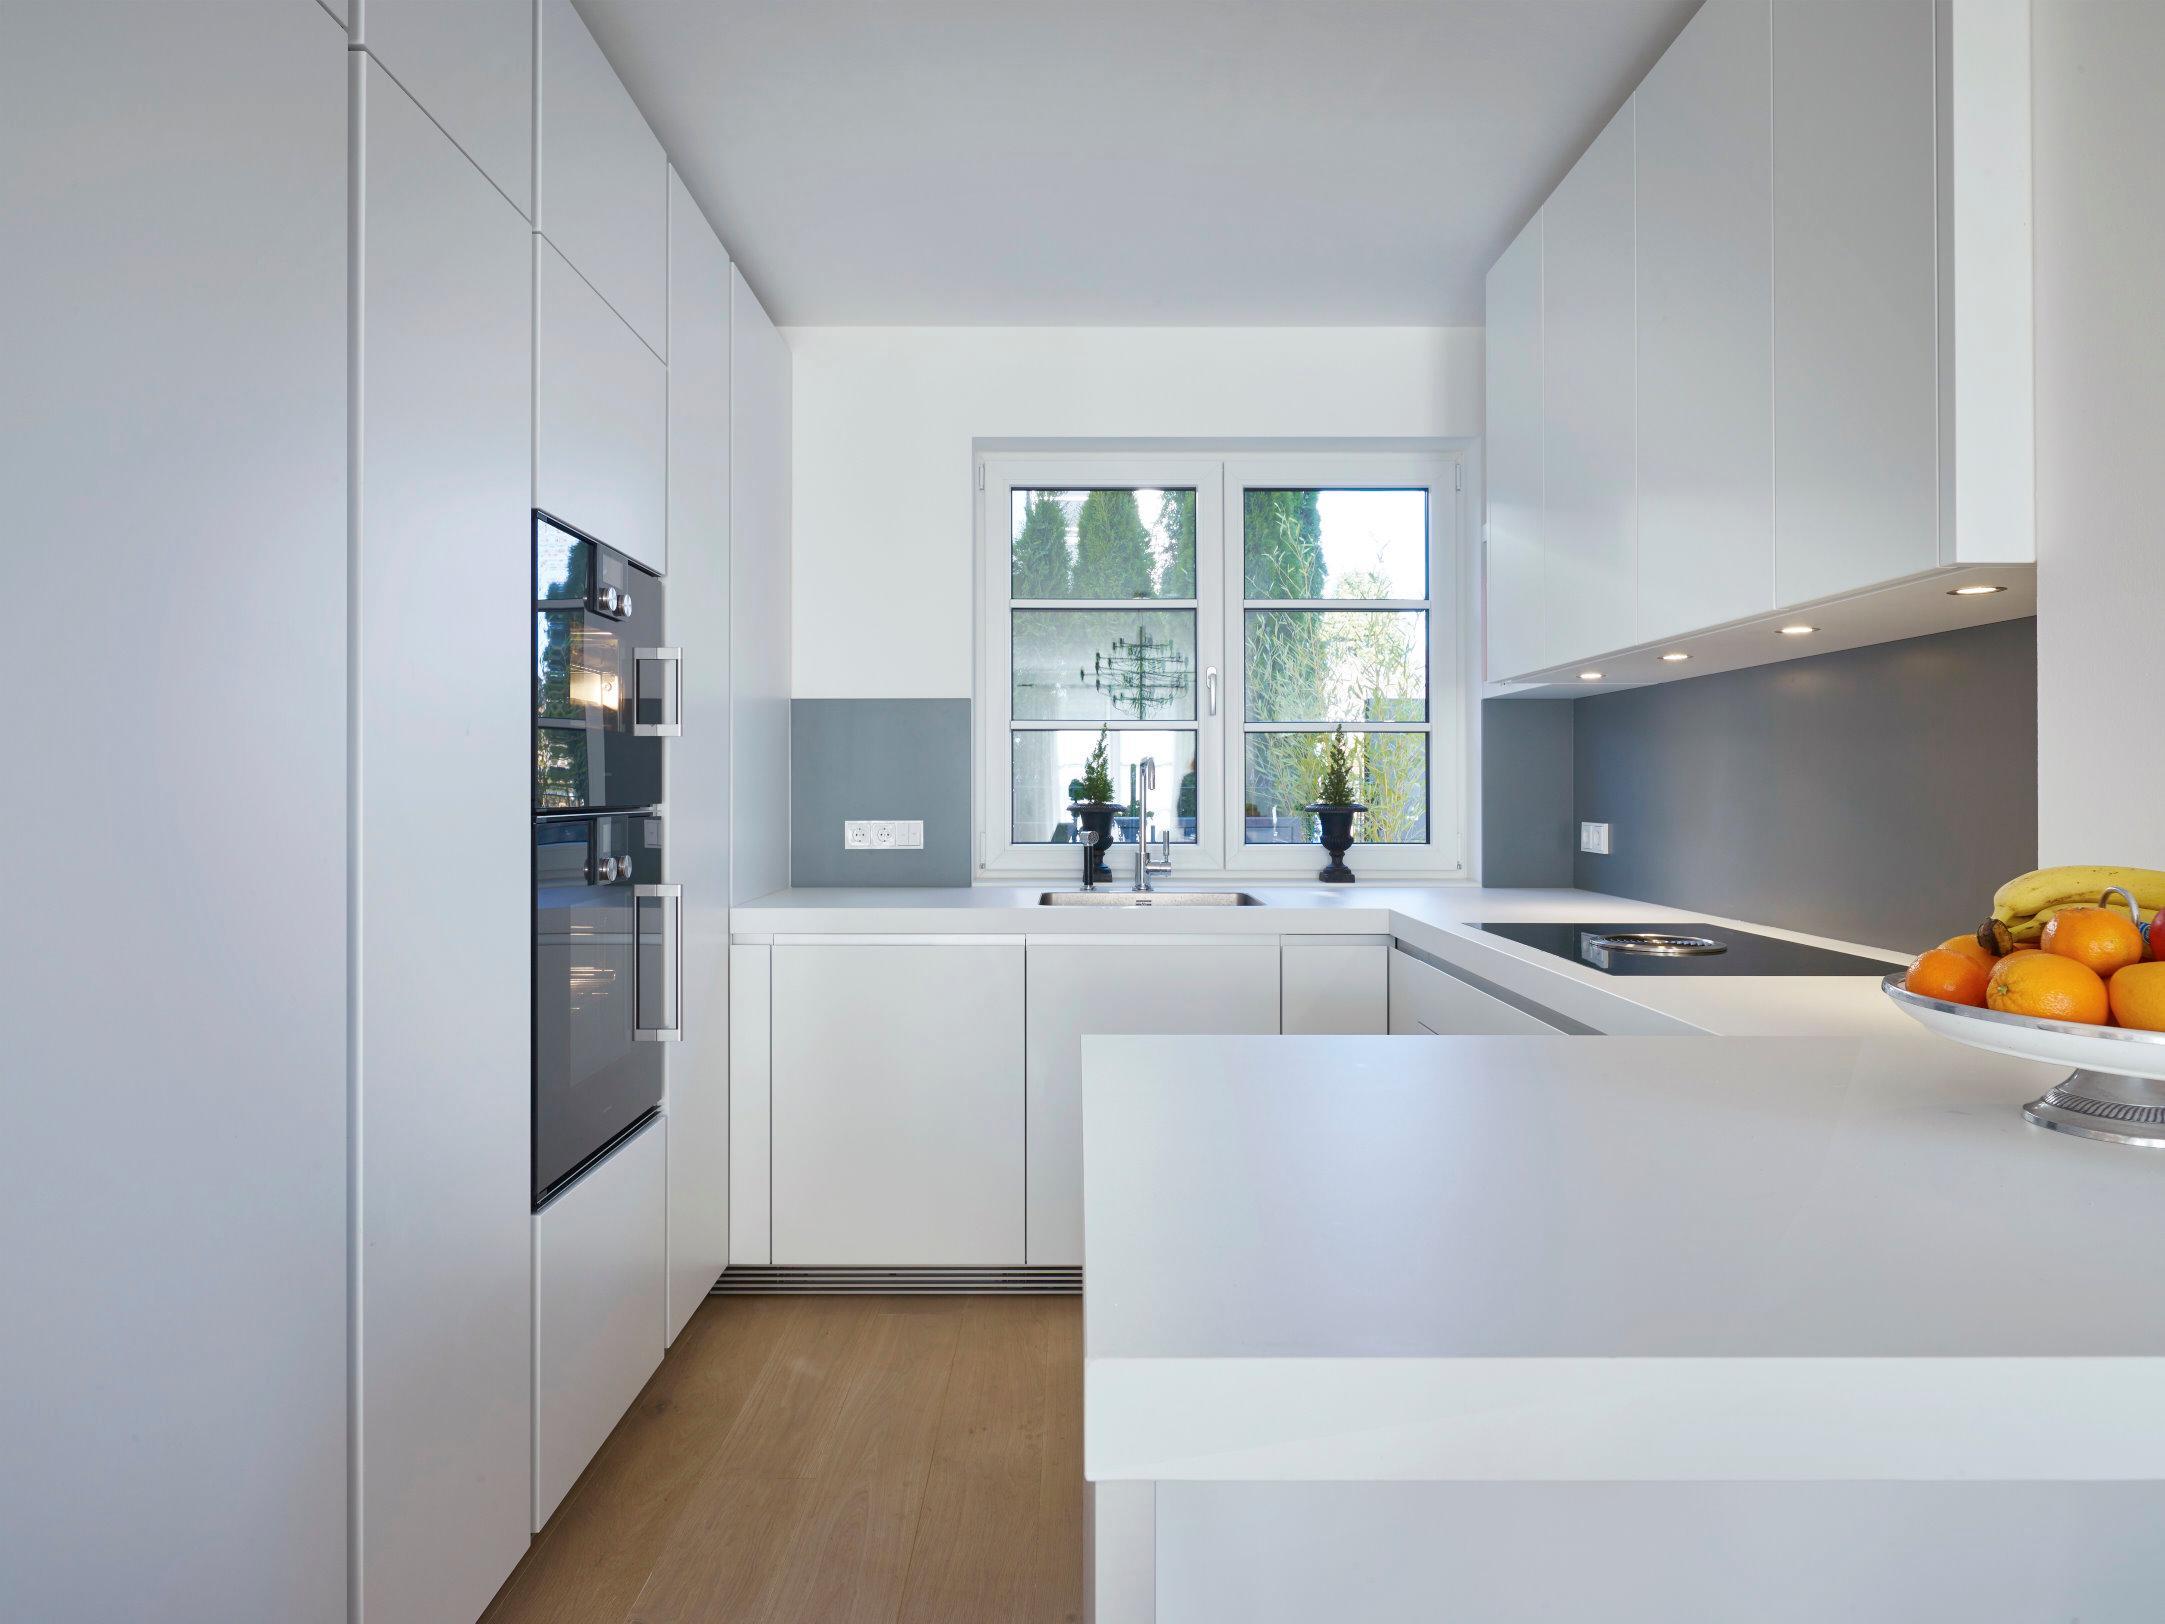 bulthaup #b1 Lebensraum München 5 #küche #laminat #k...